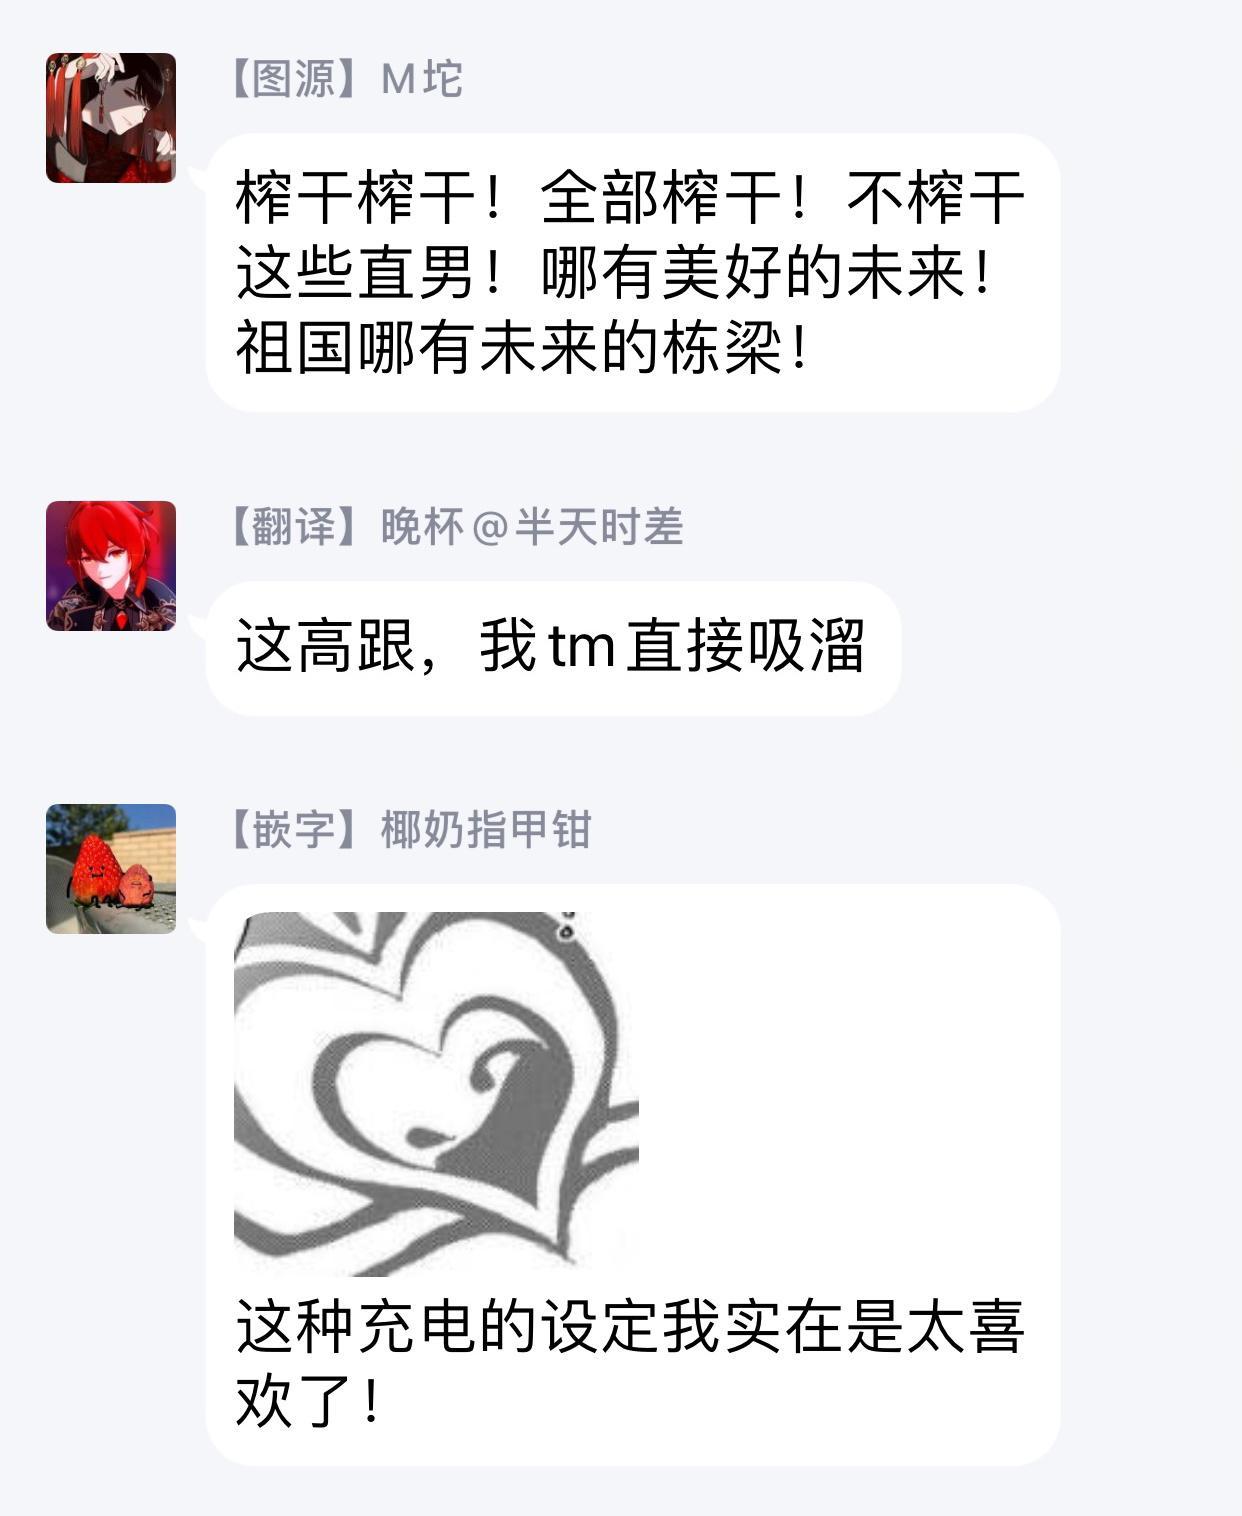 [Yao] Inma-sama ni Hallelujah!   赞美淫魔大人! Ch. 1-3 [Chinese] [拾荒者汉化组] [Digital] 35